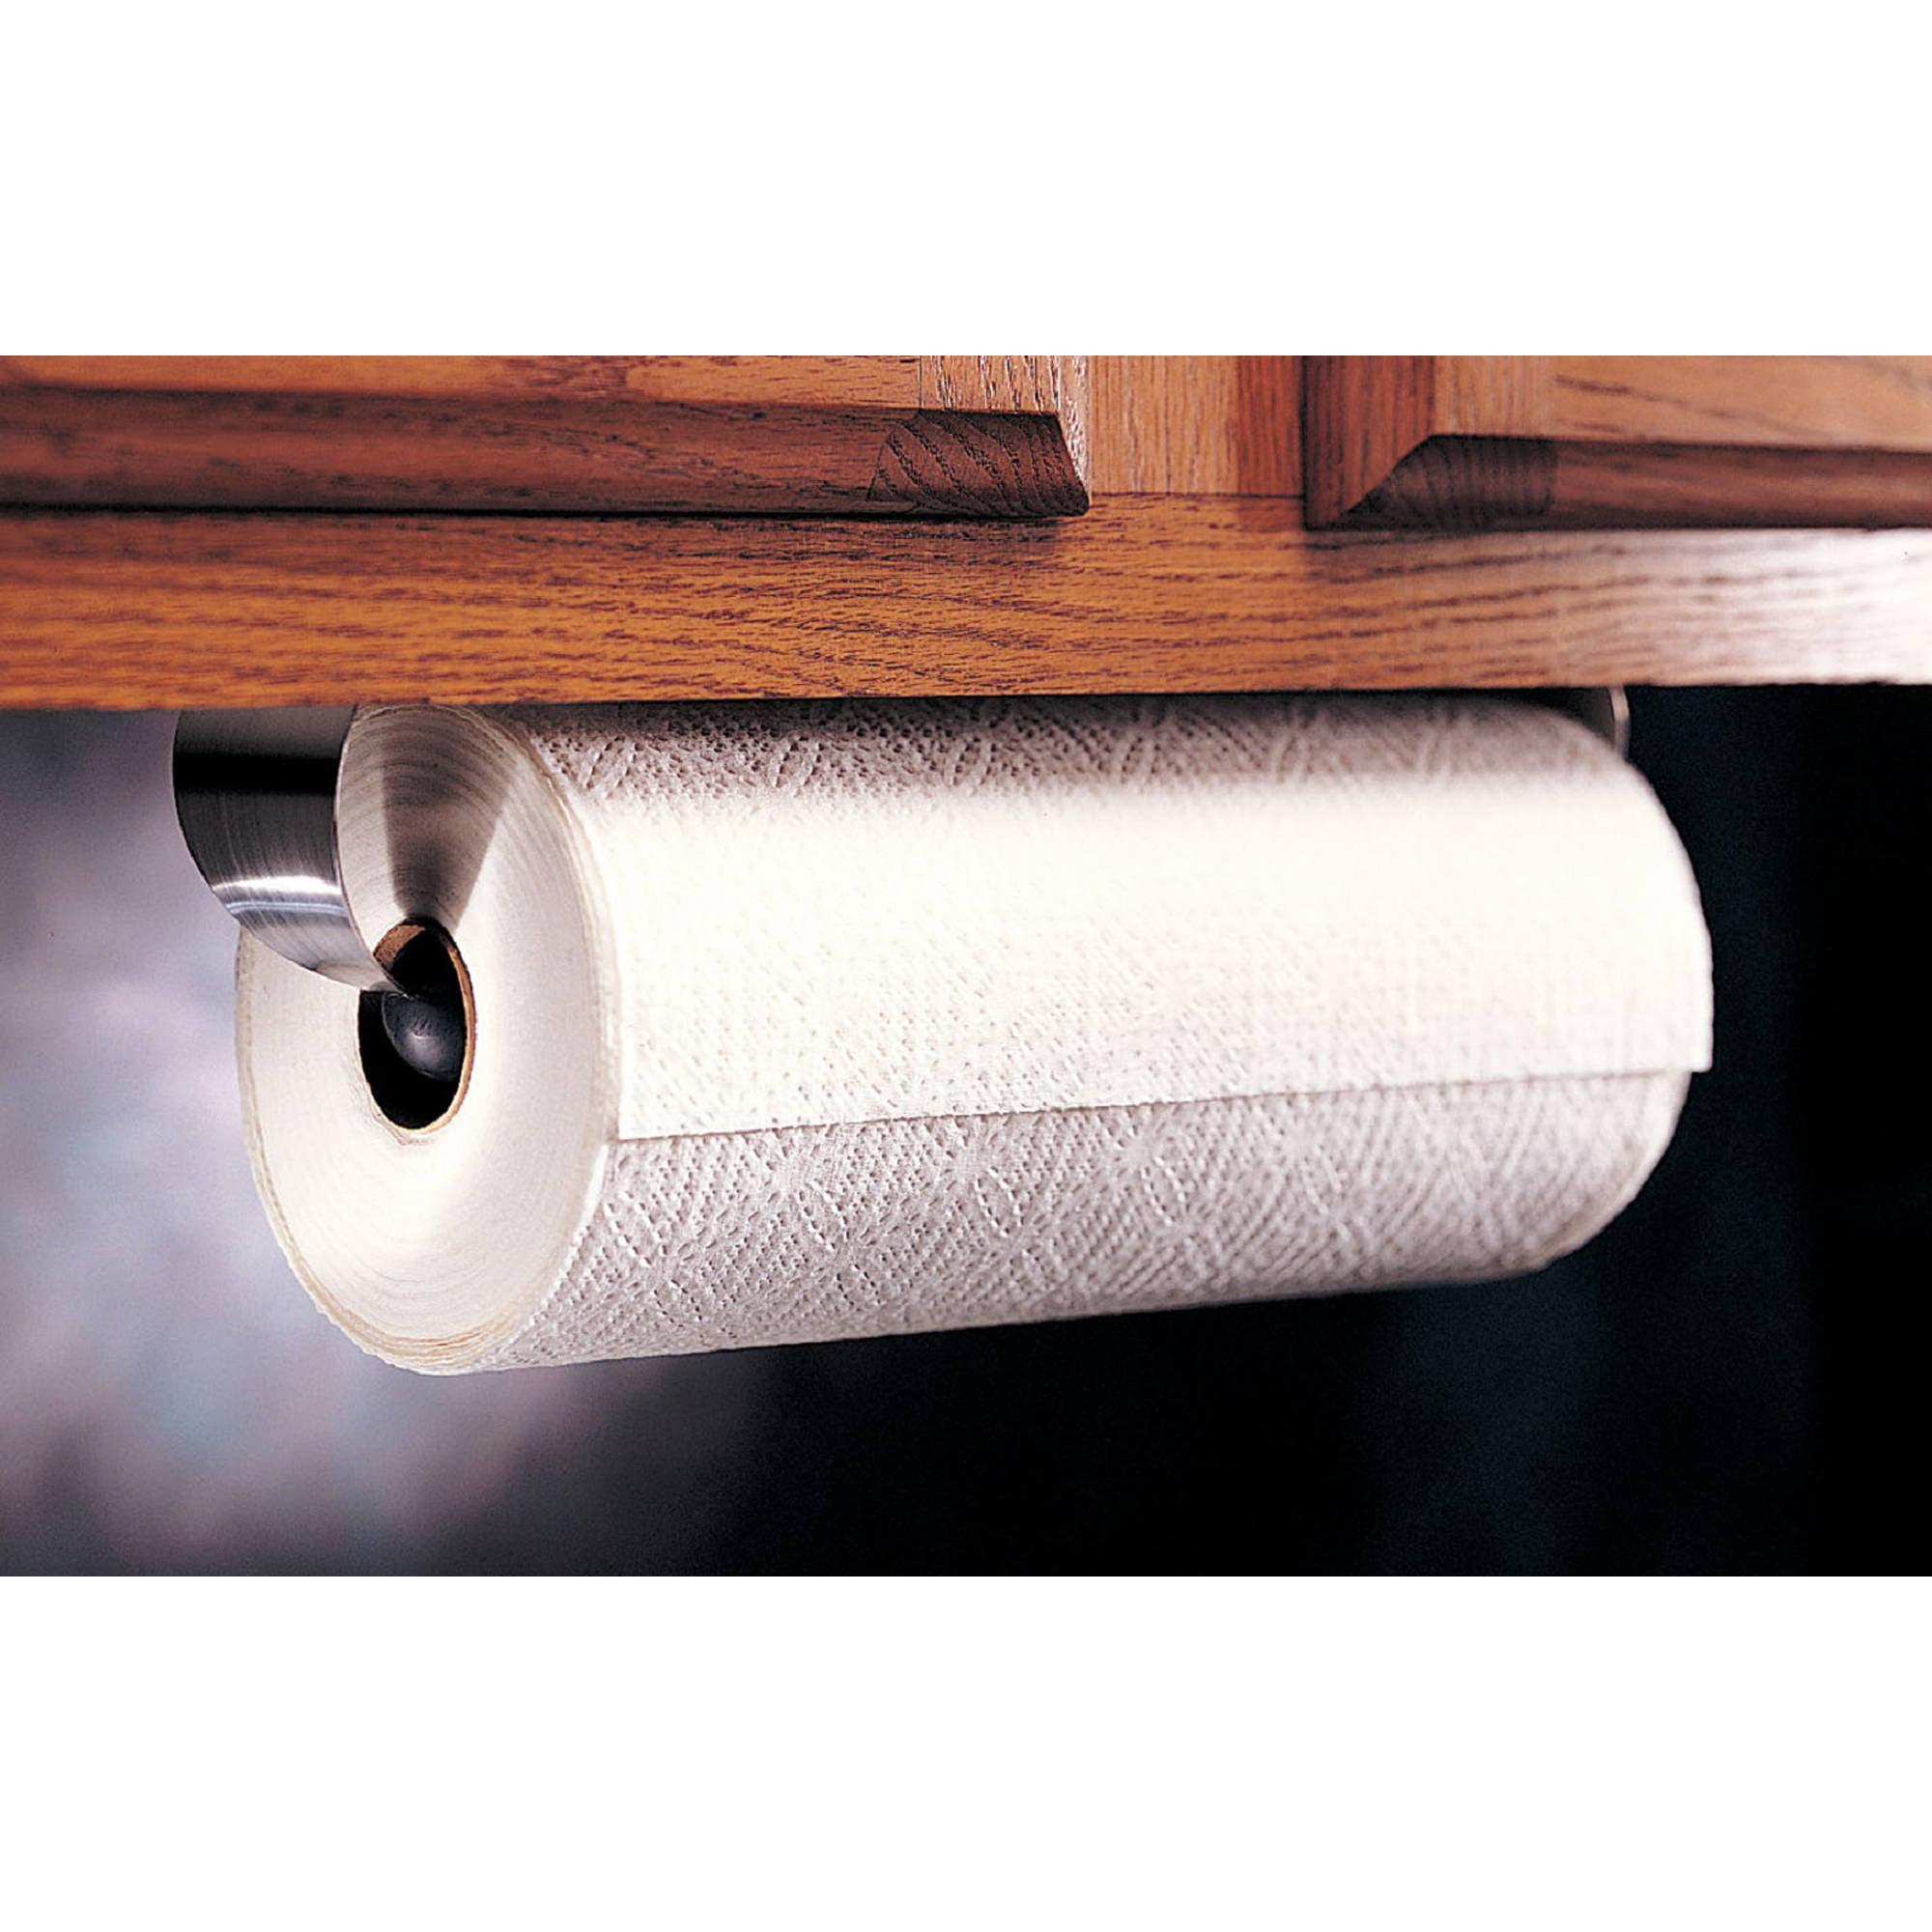 Prodyne Stainless Steel Under Cabinet Paper Towel Holder